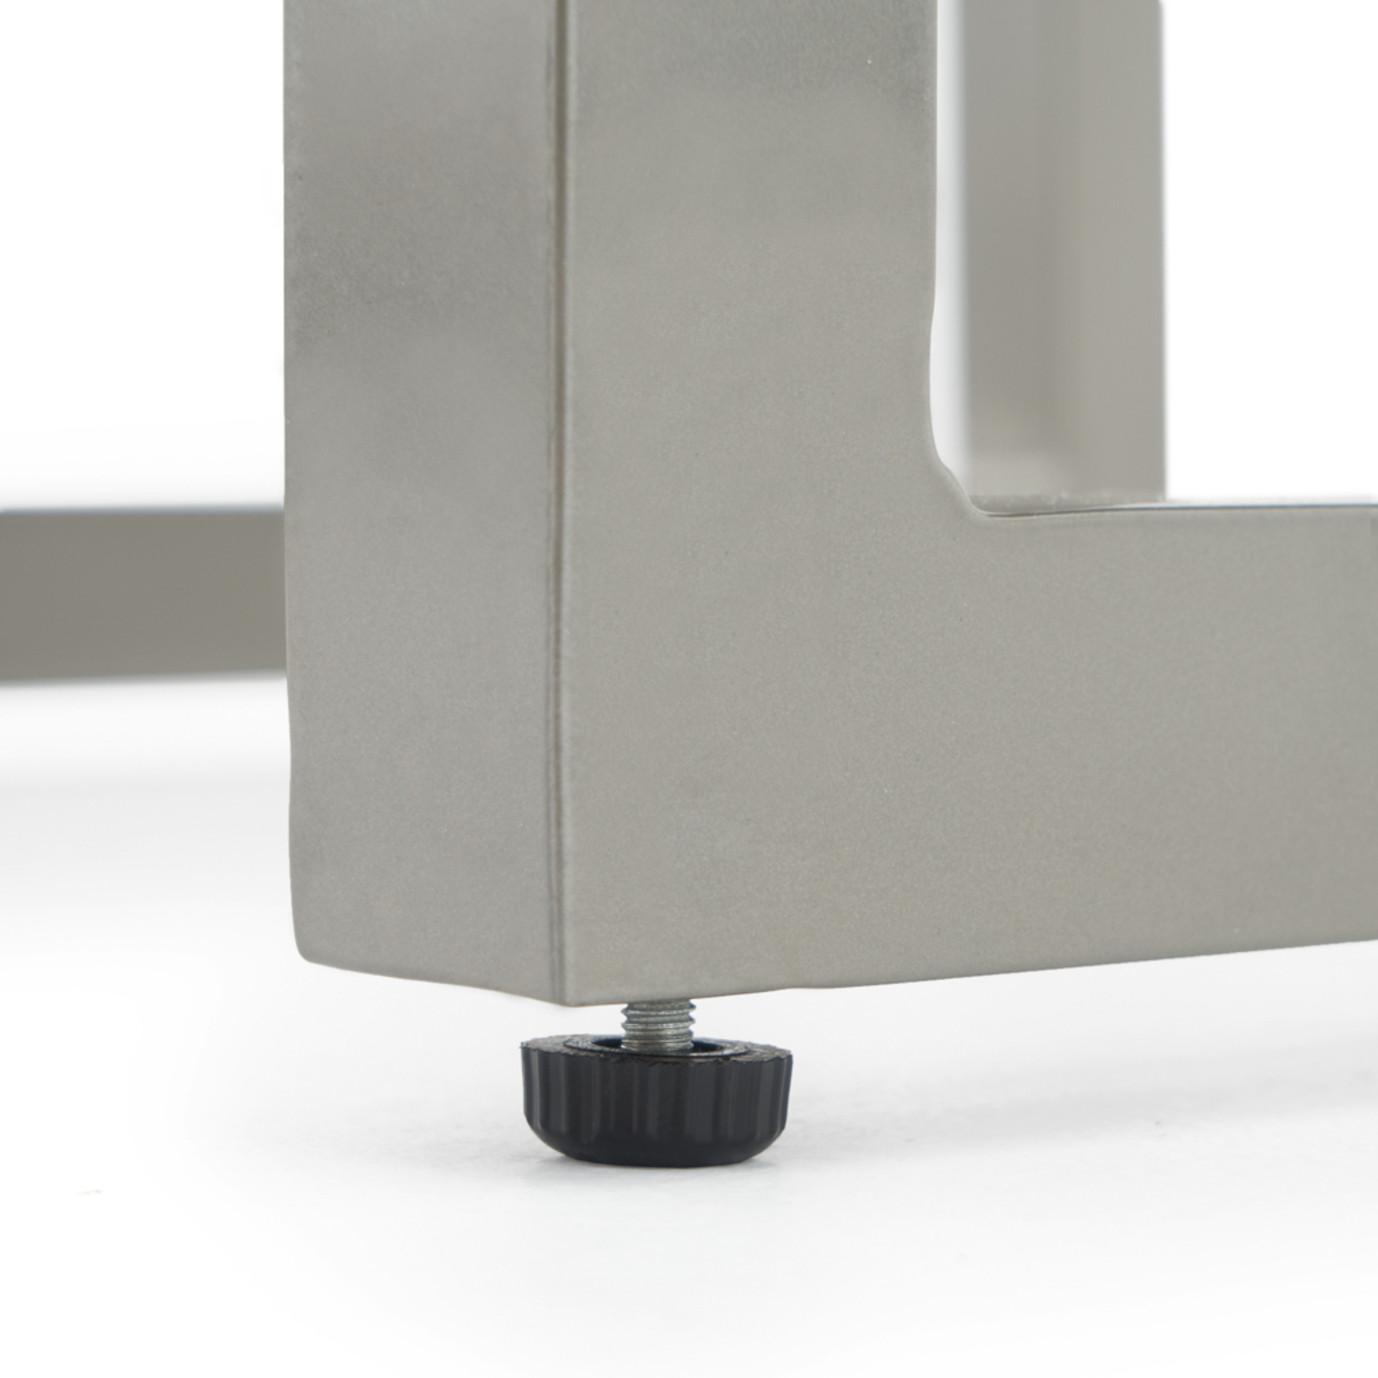 Milo™ Espresso 7pc Motion Deep Seating Set - Navy Blue